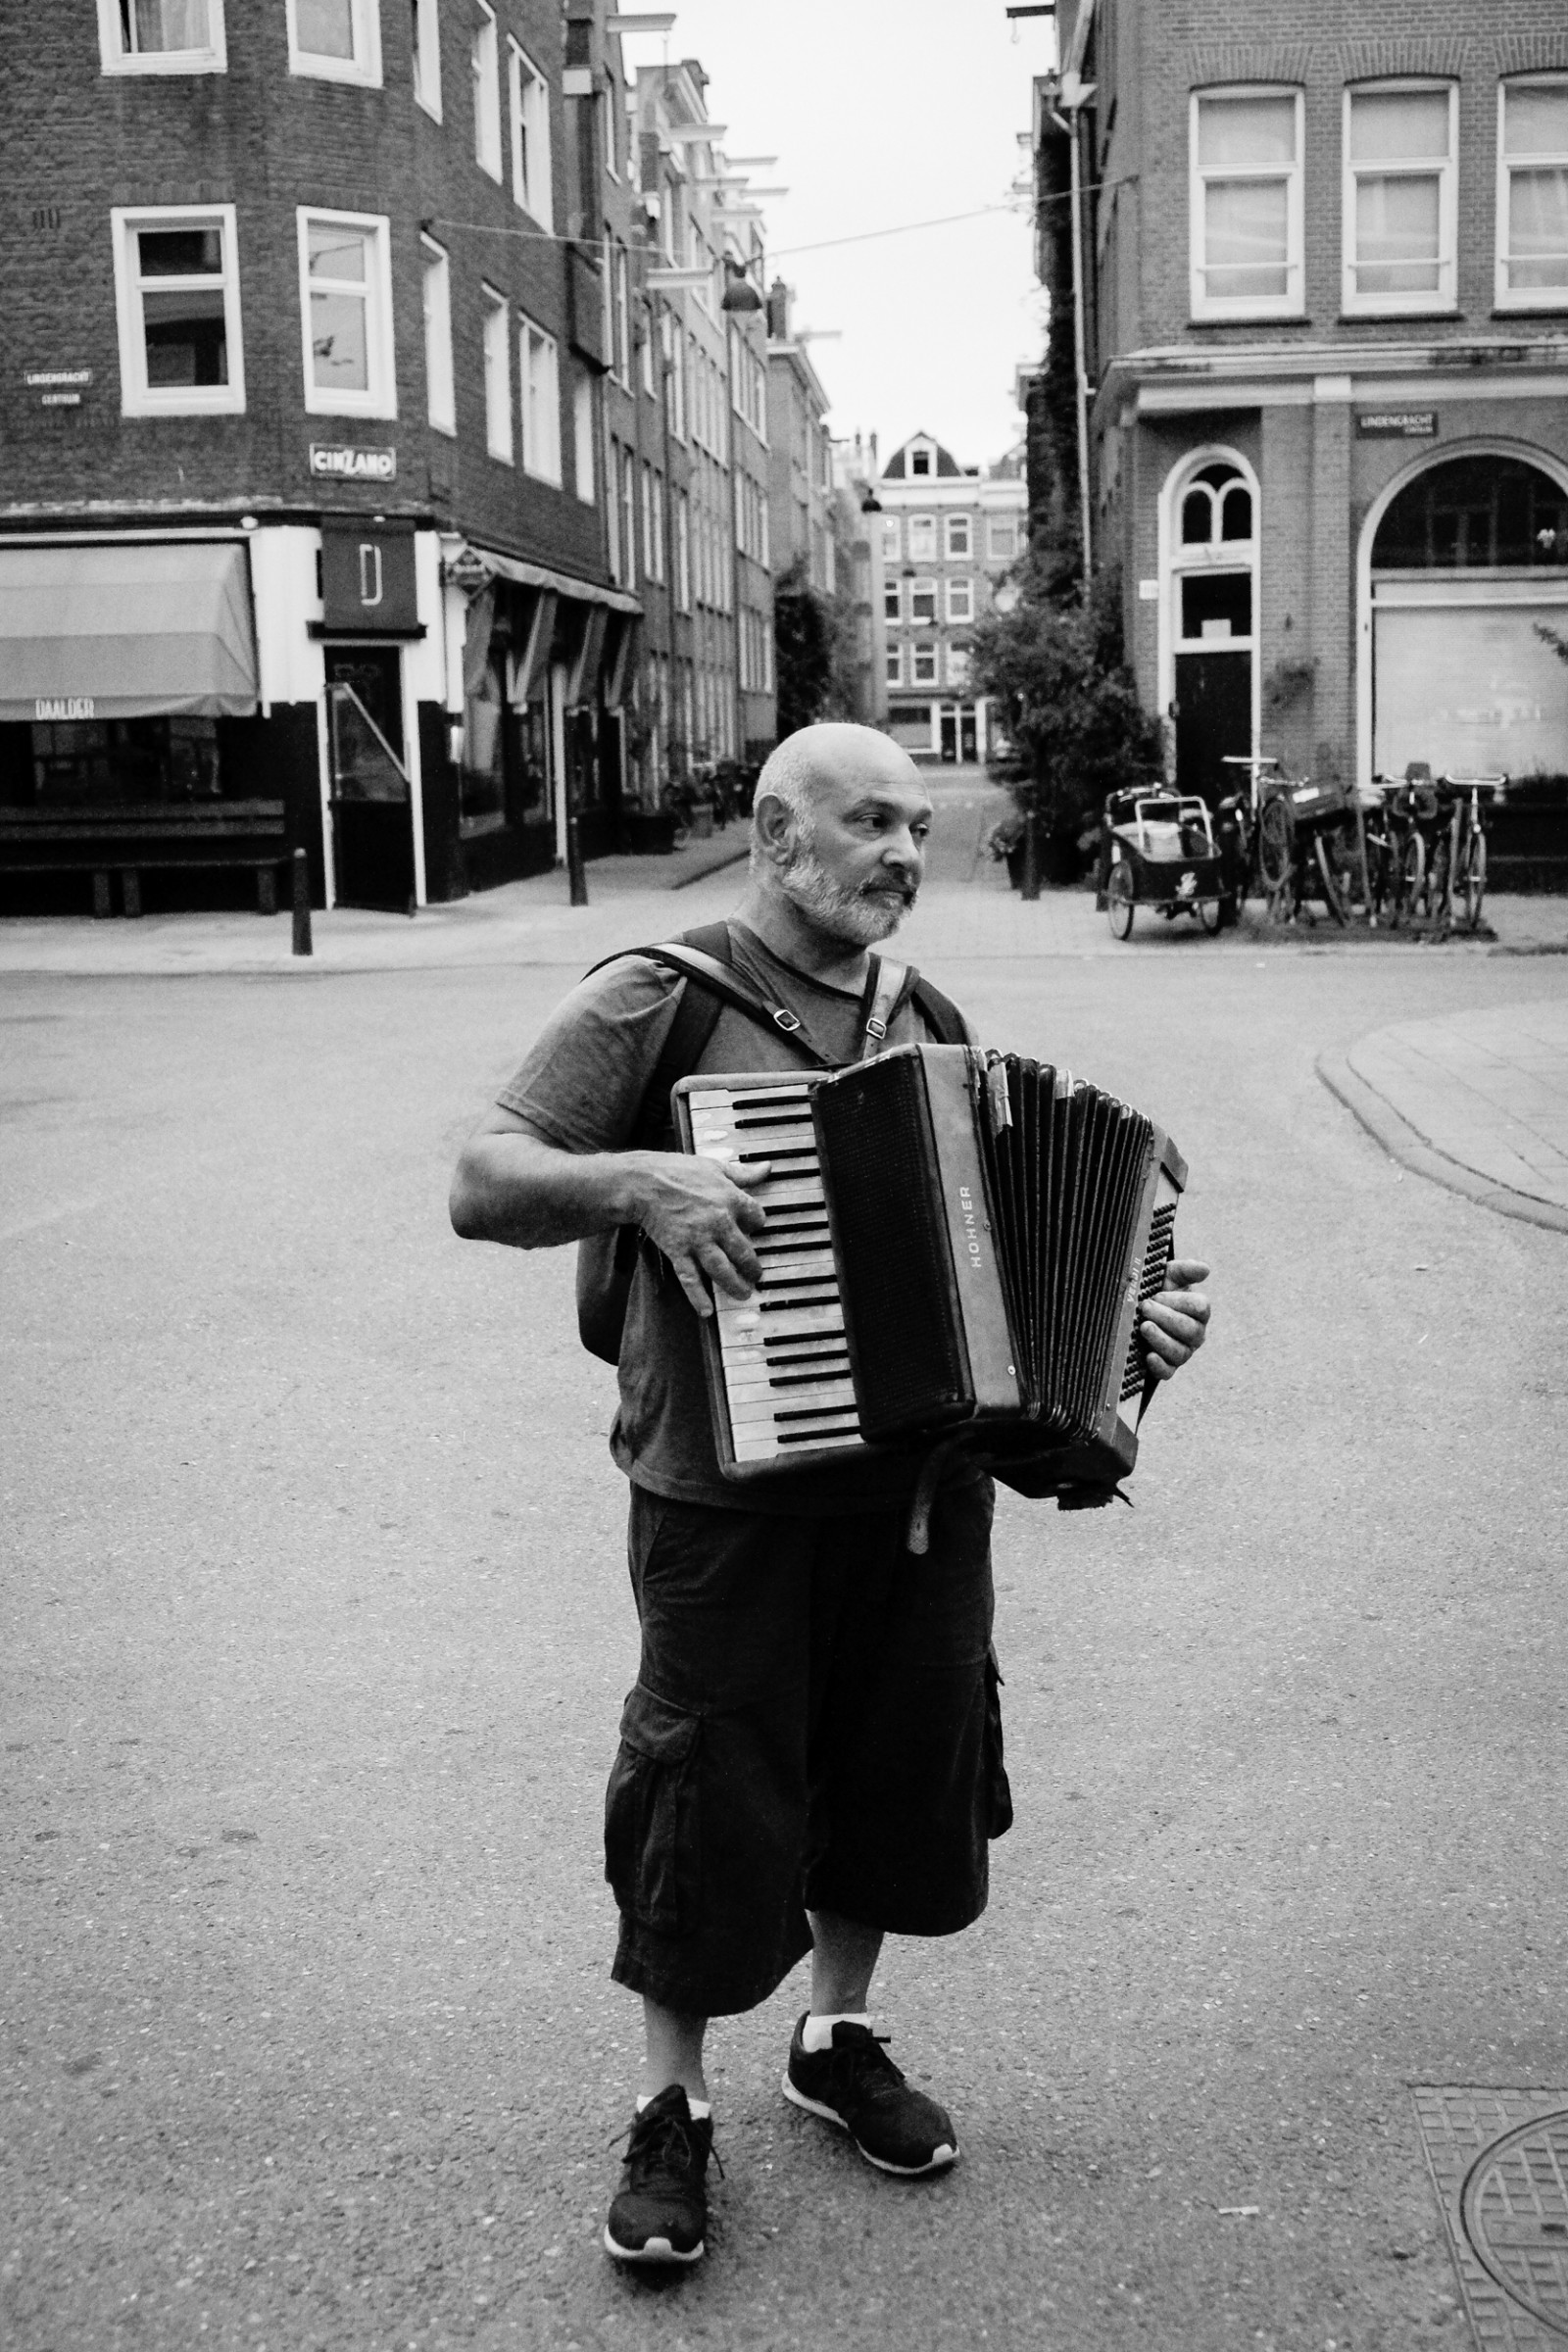 Amsterdam Photo Tour guy playing instrument